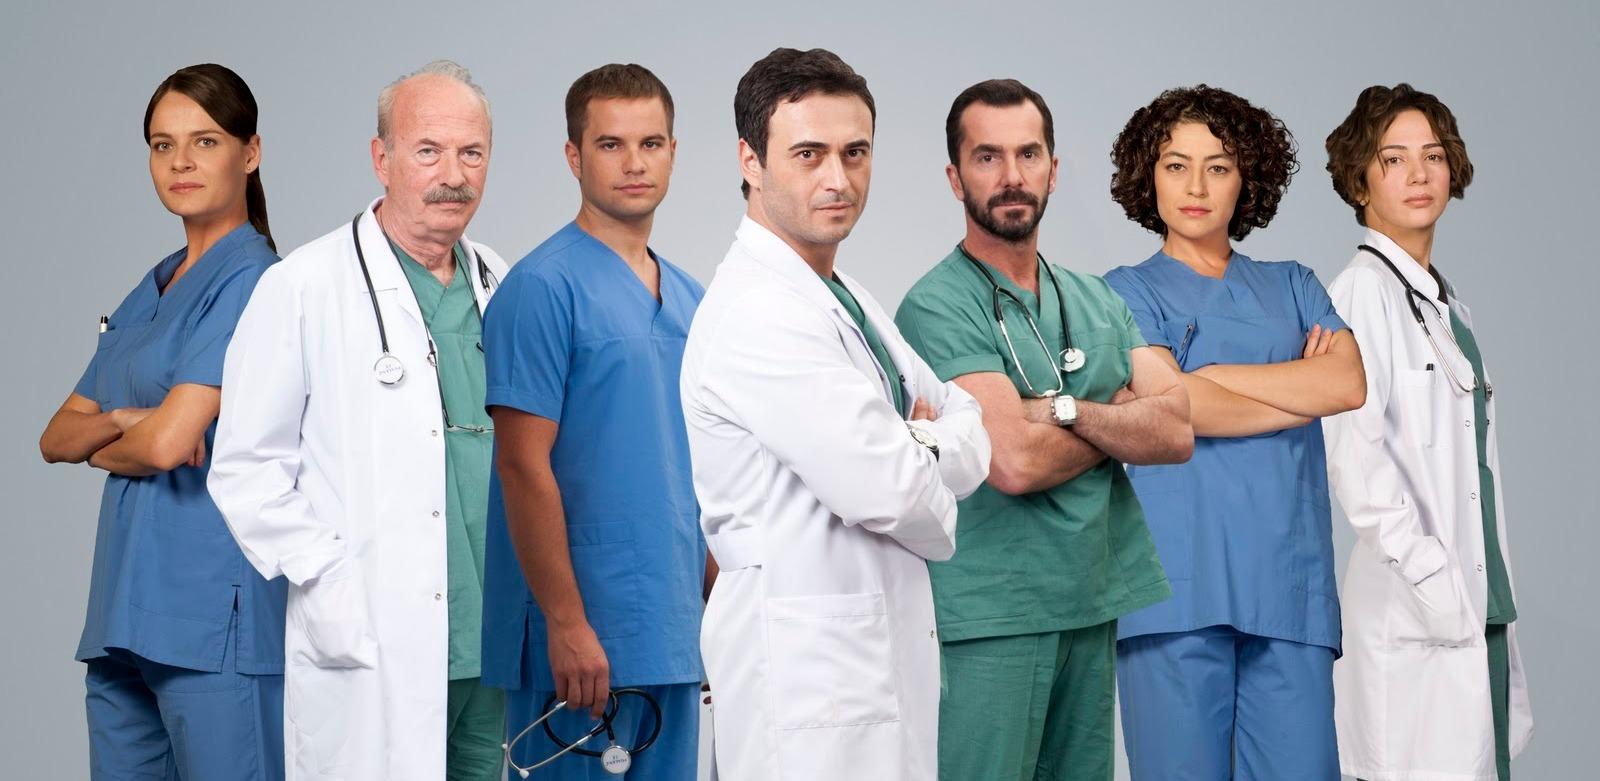 İki günah keçisi: Doktorlar ve Papatyam